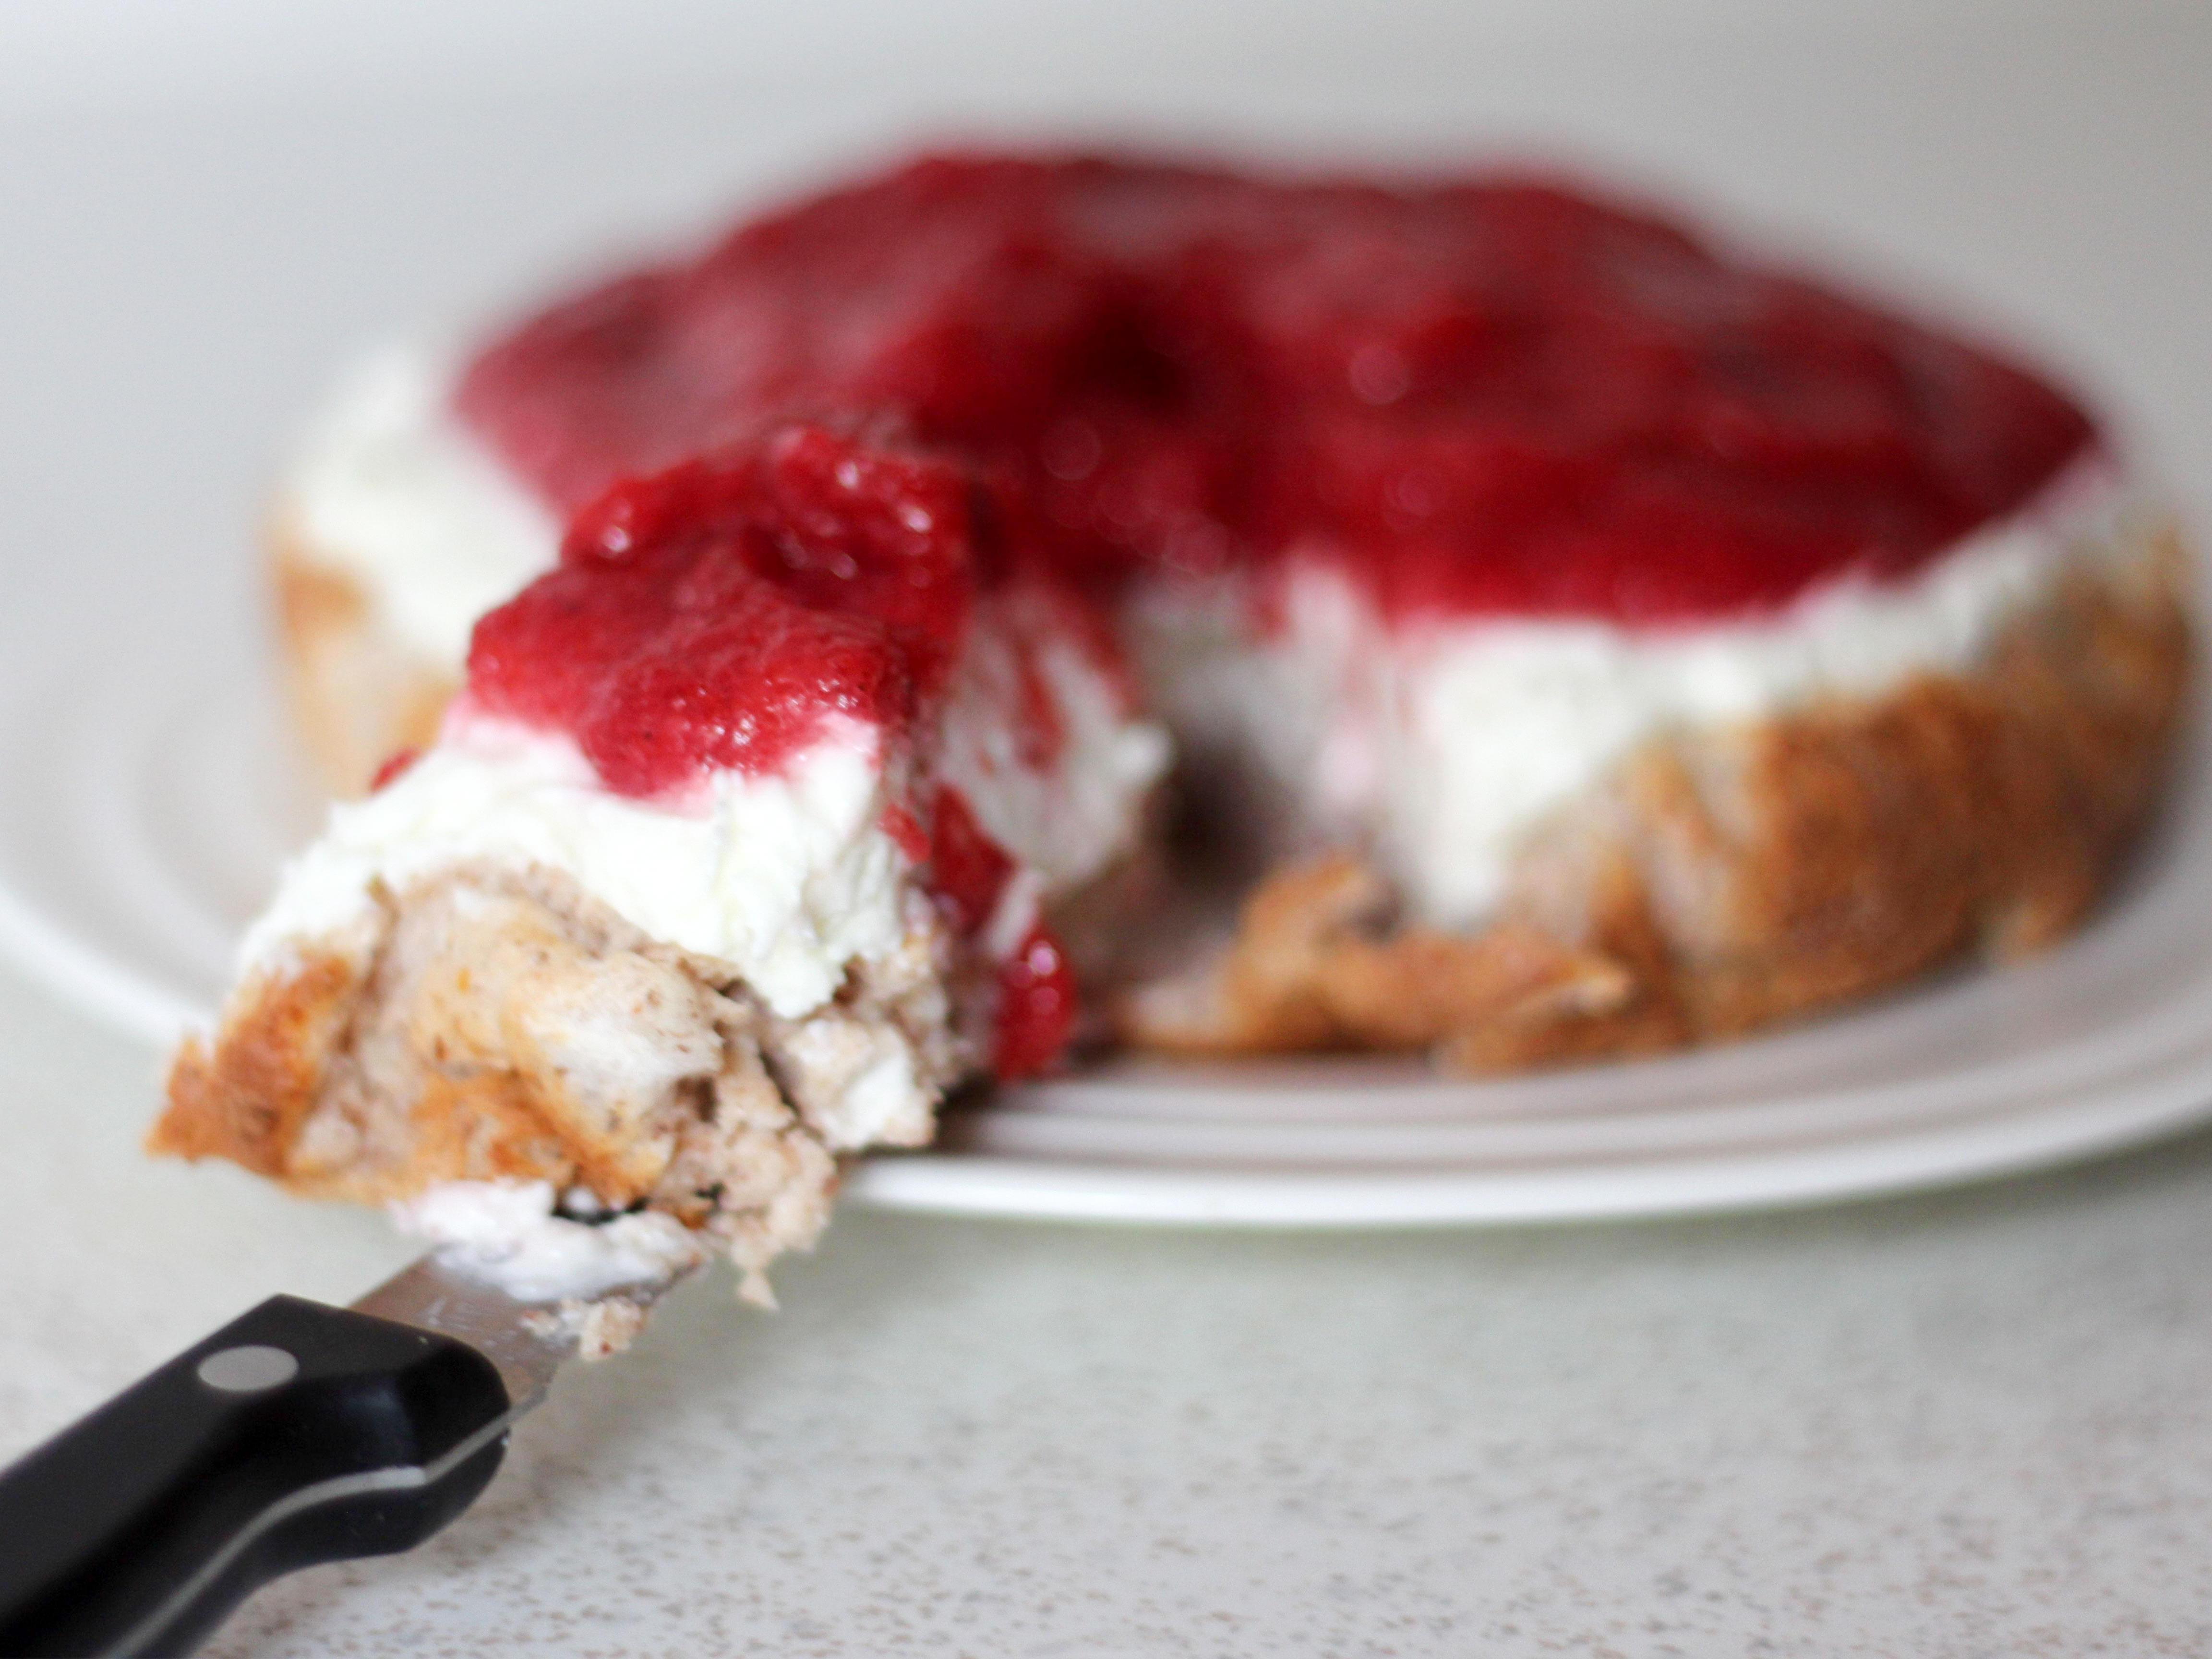 Low carb jagodna torta brez moke